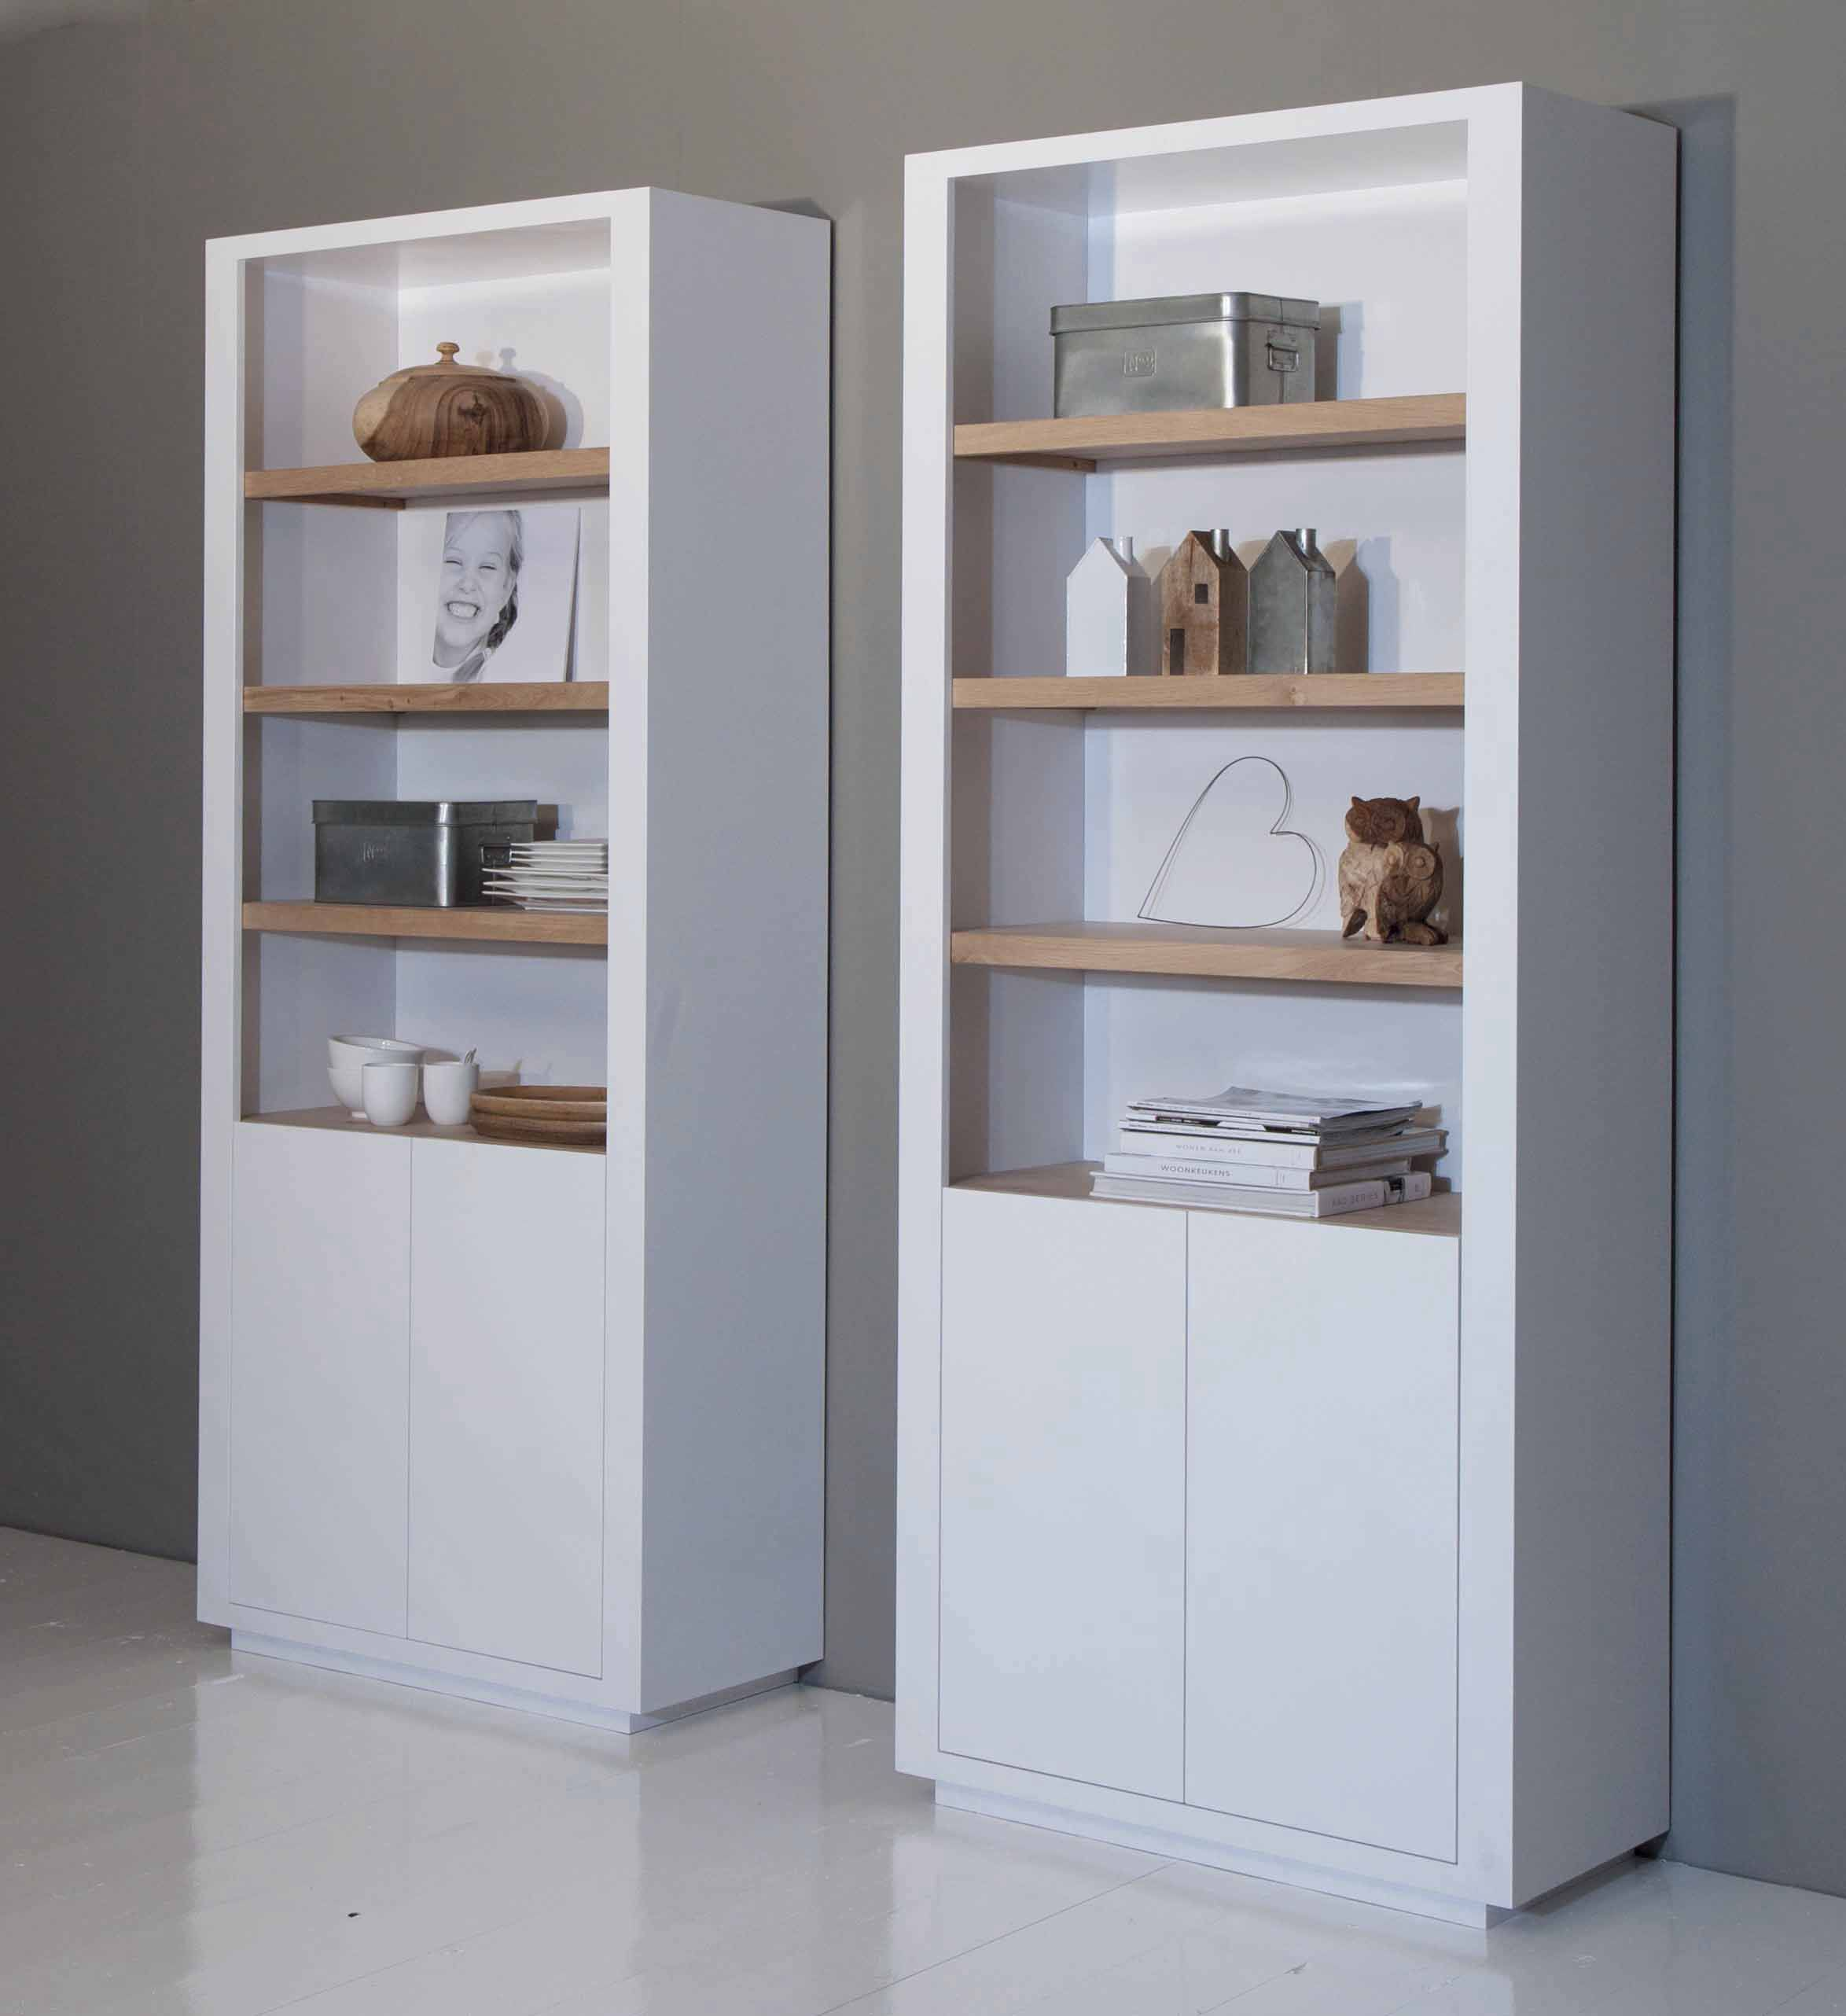 2 kasten naast elkaar evt in woonkamer wanneer de ruimte te leeg zou zijn august proef - Moderne boekenkast ...